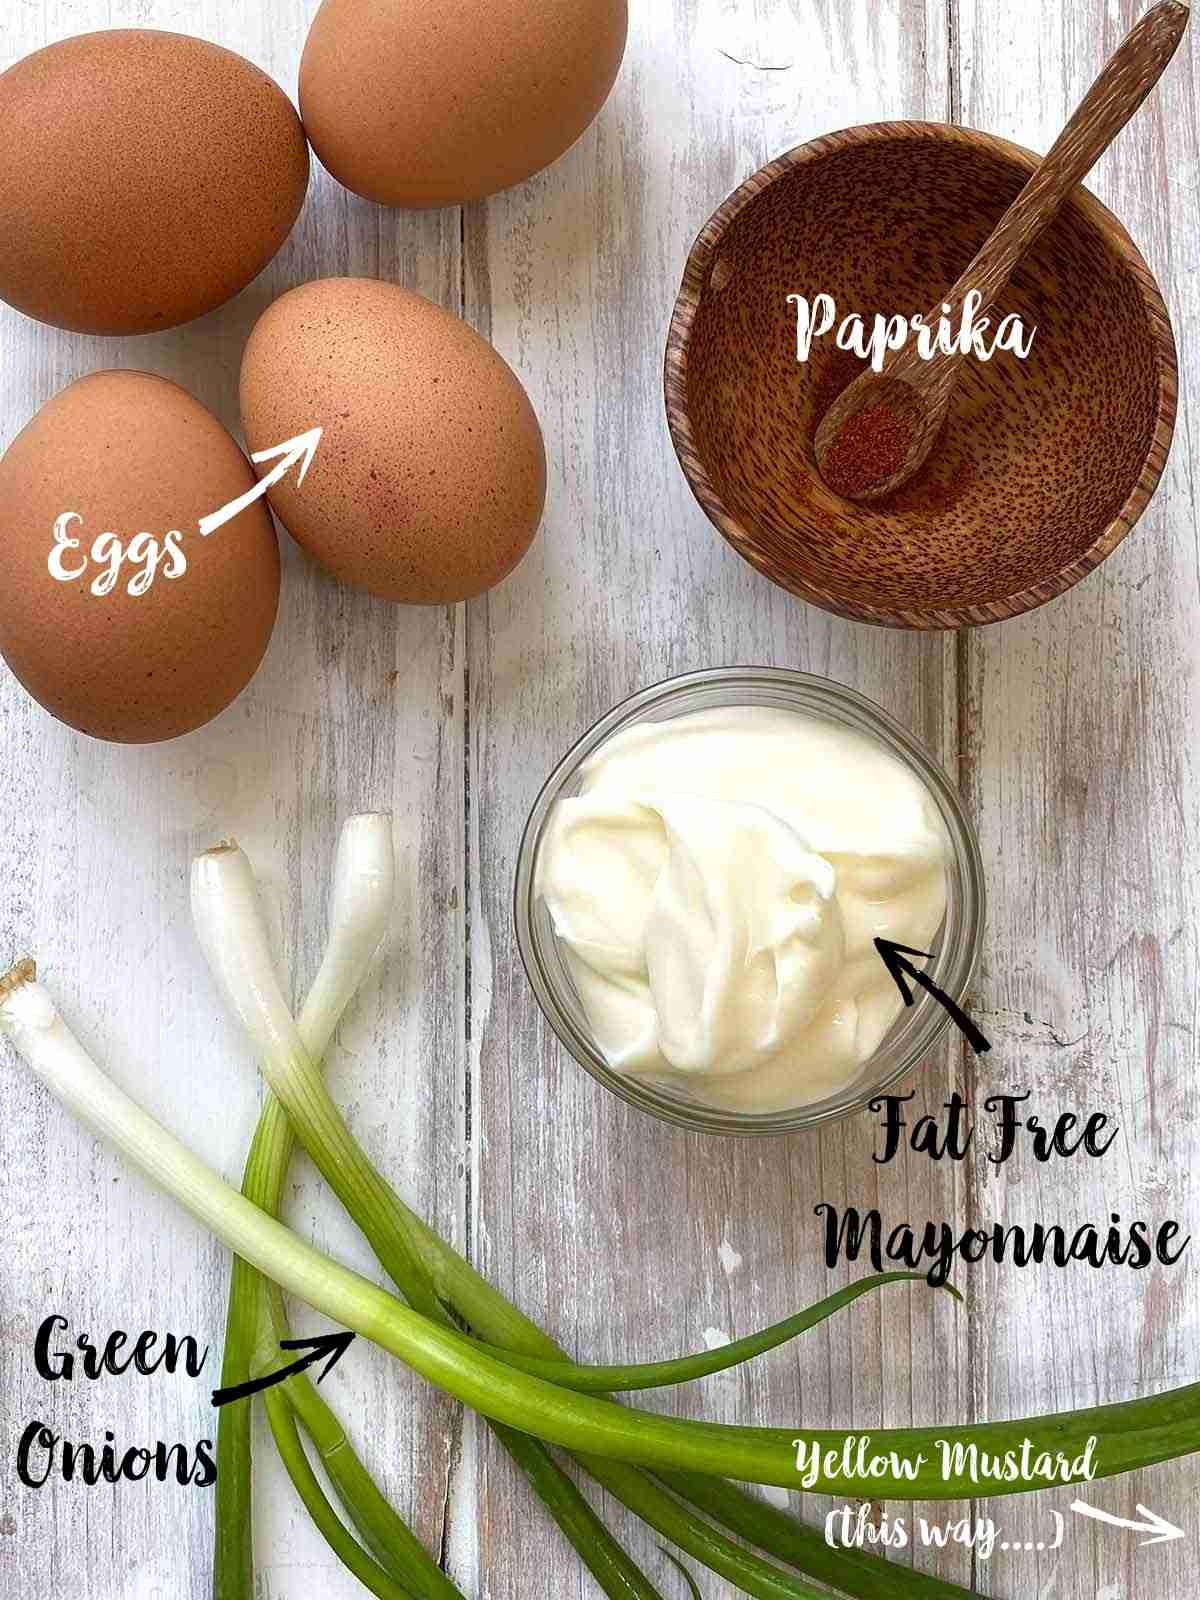 Ingredients used to make egg salad